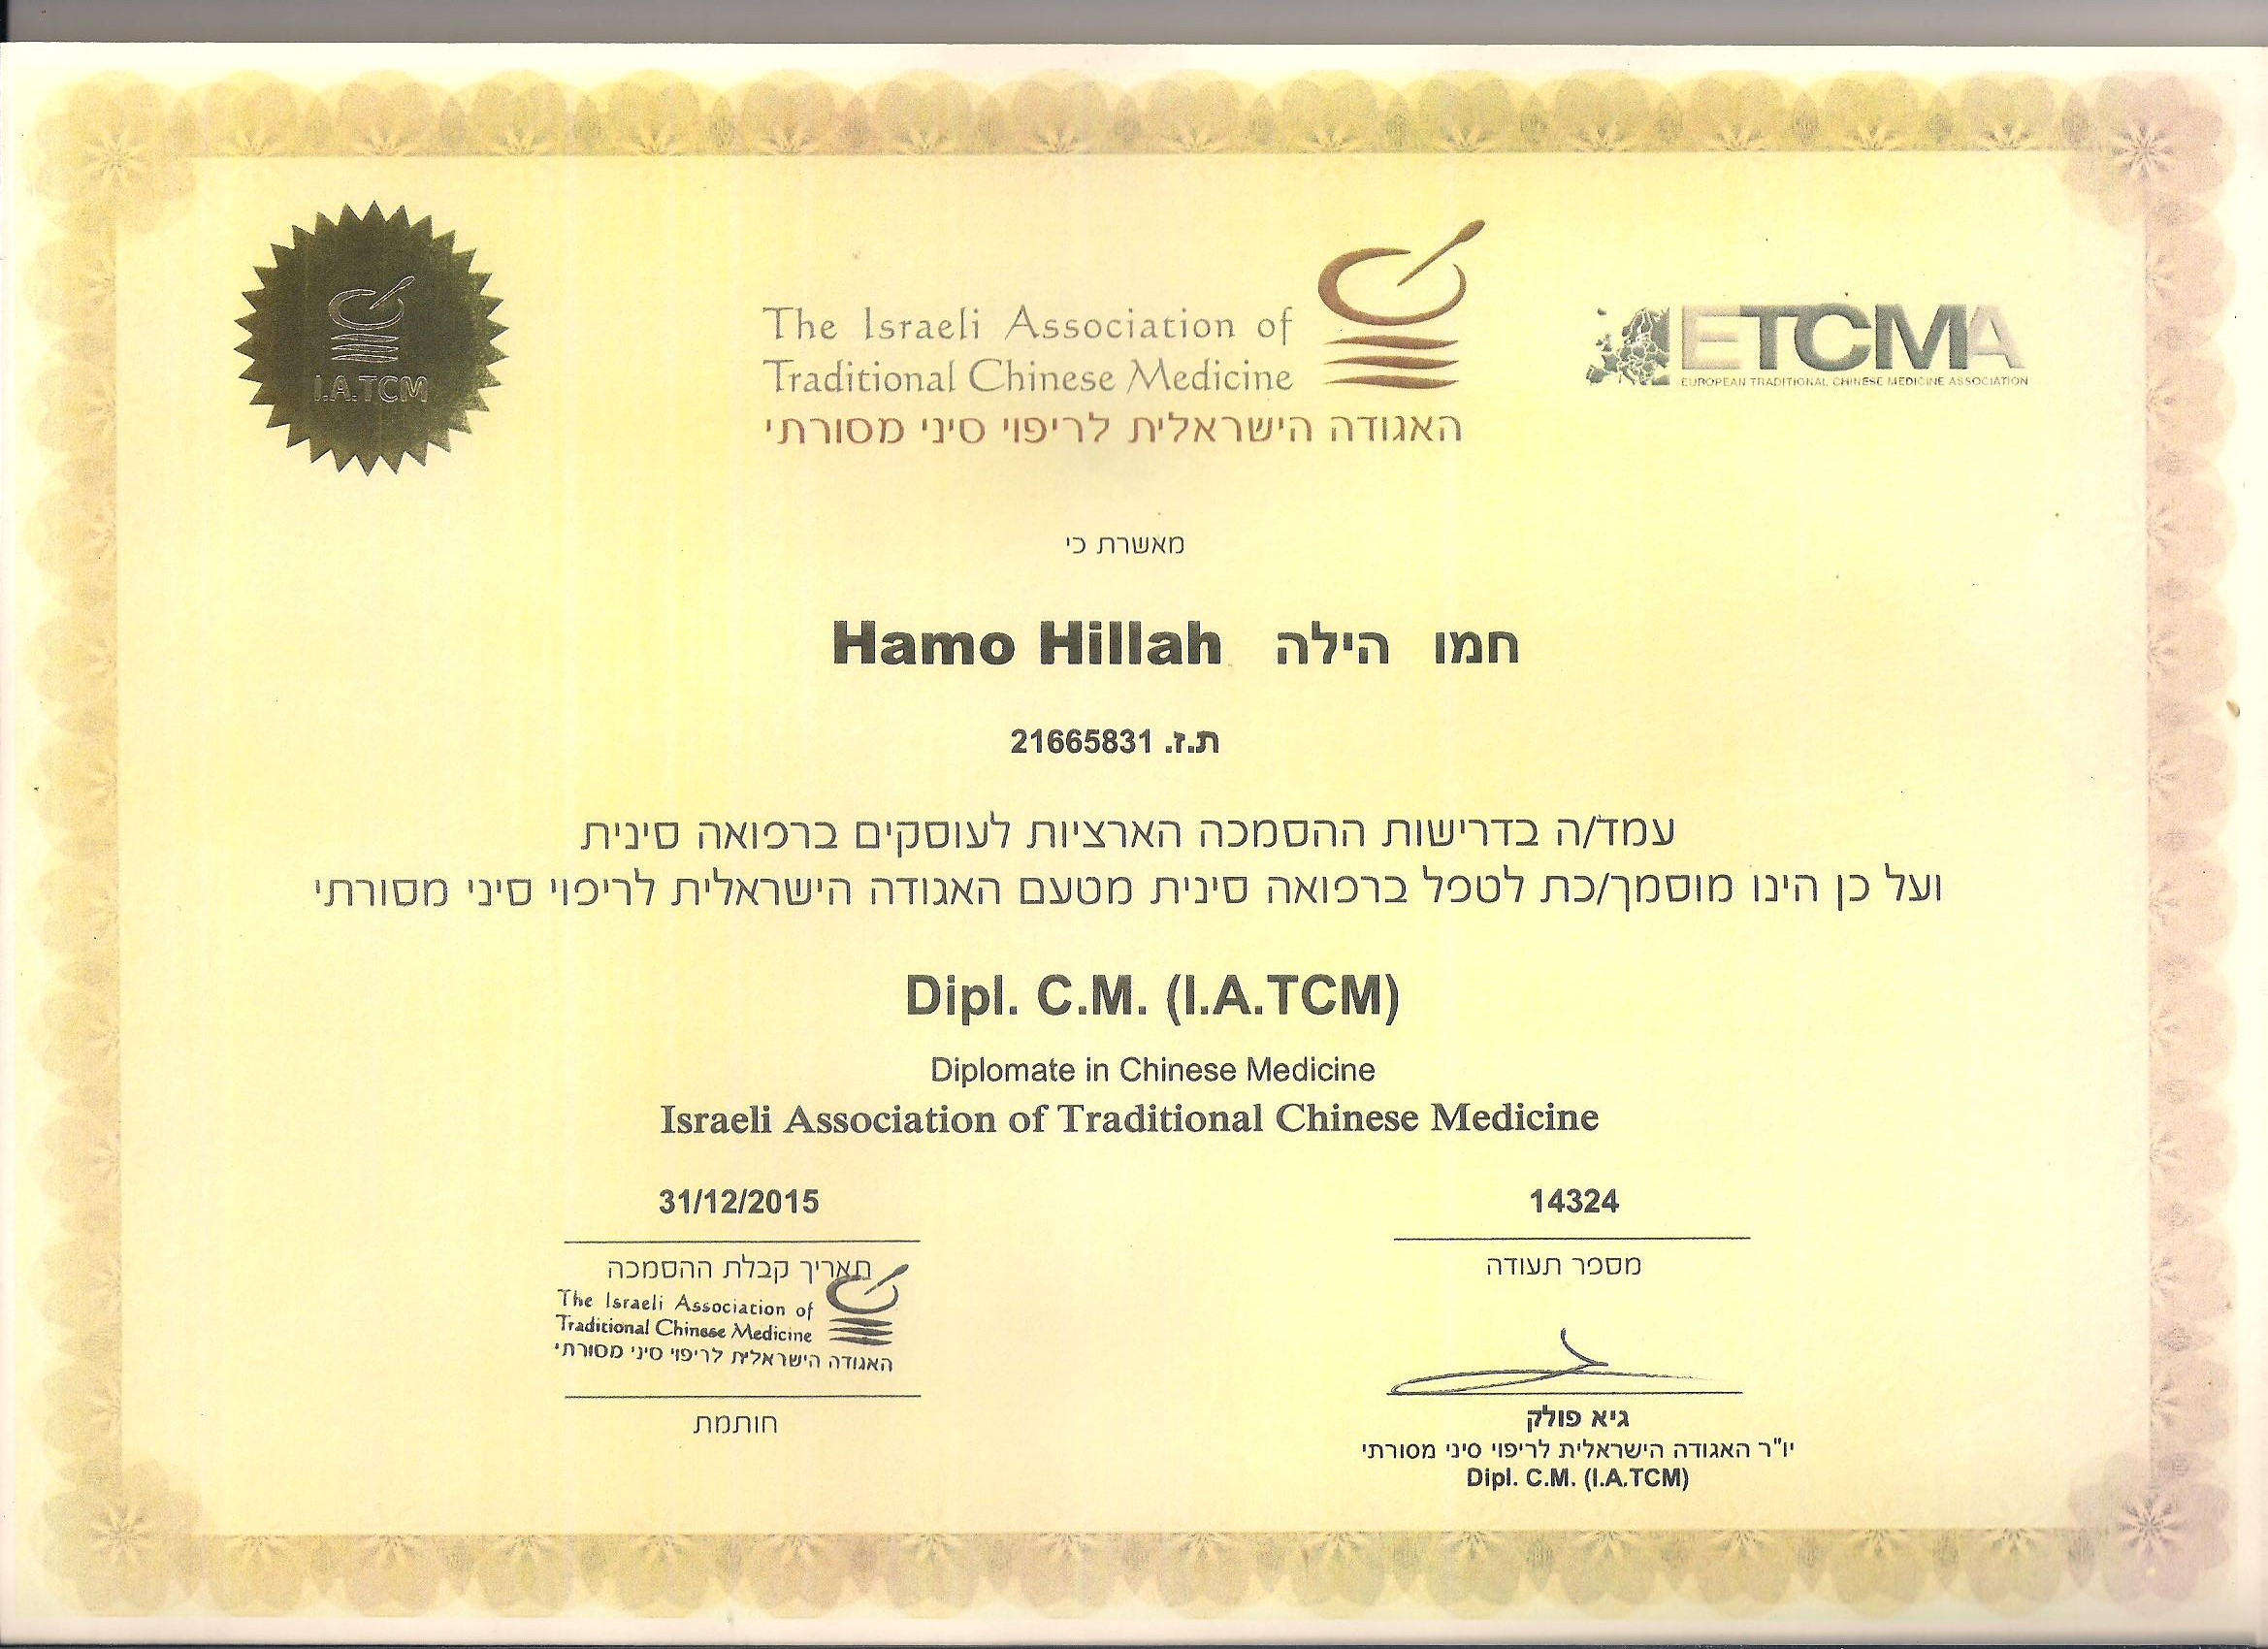 ETCMA certification